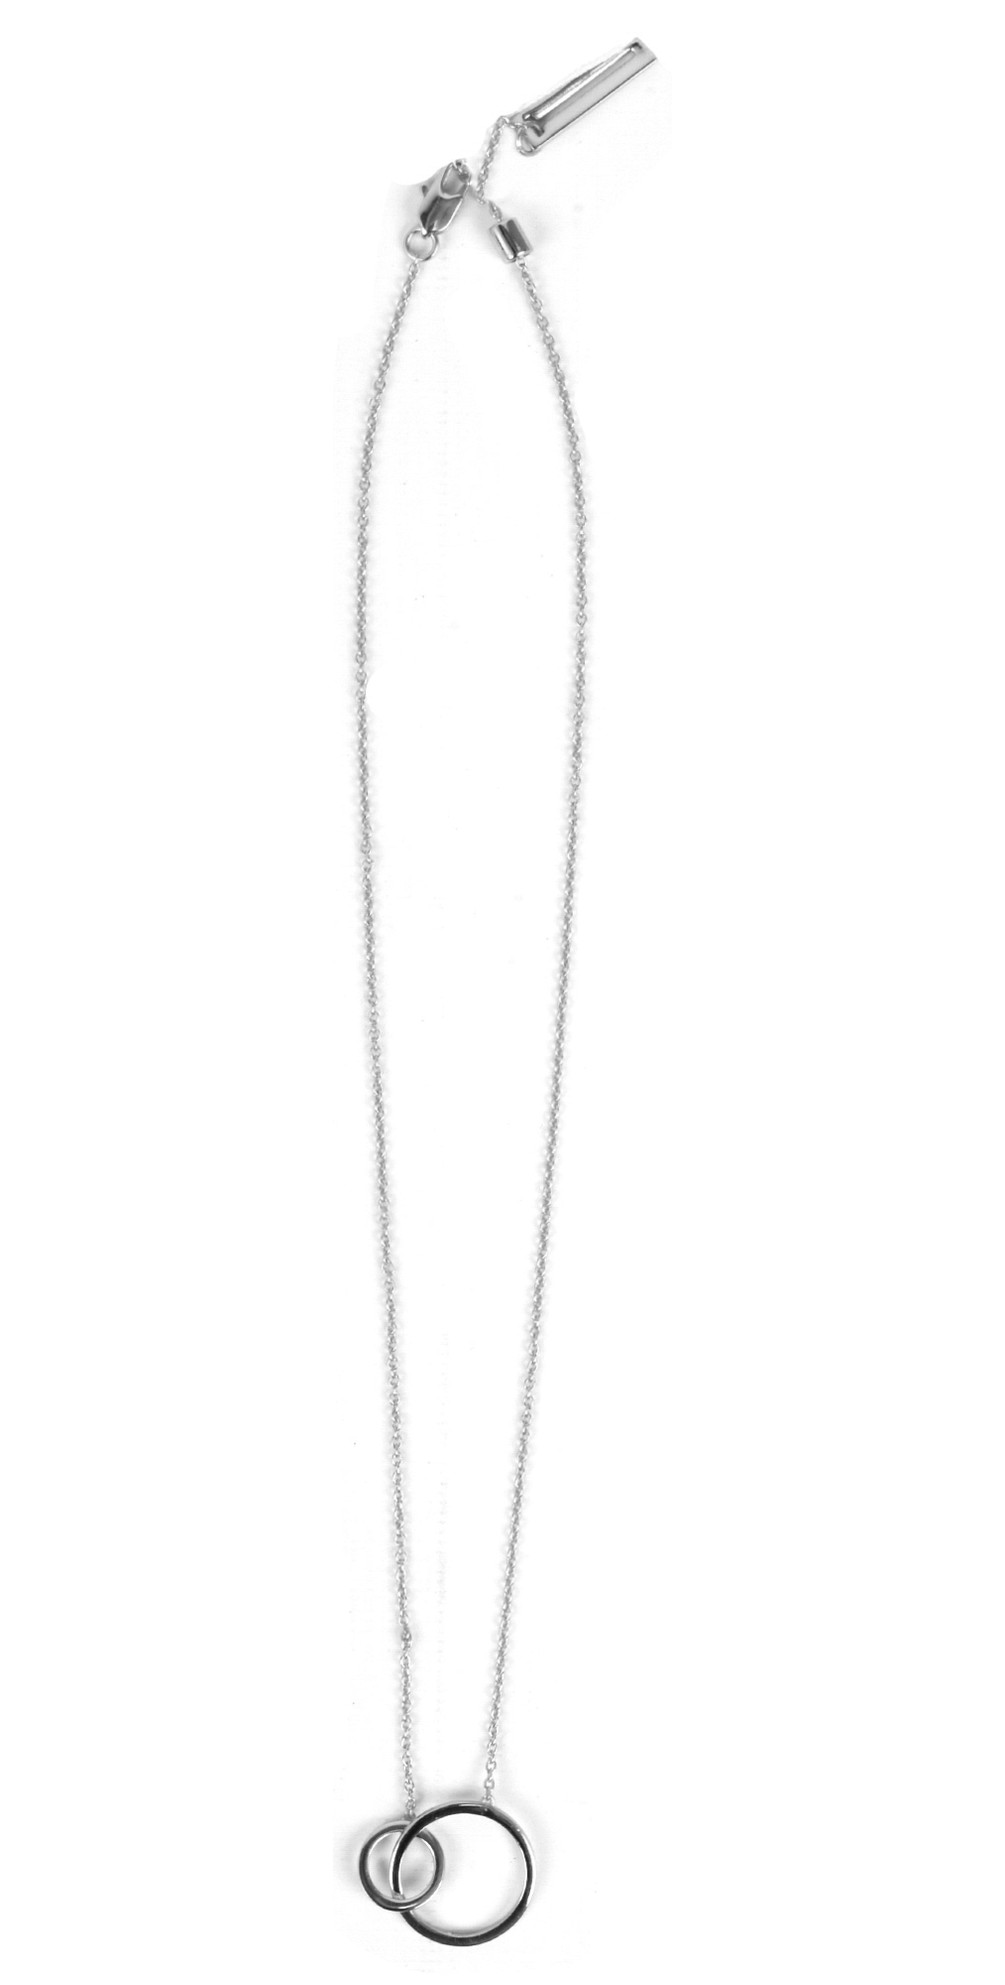 Orbit Necklace main image